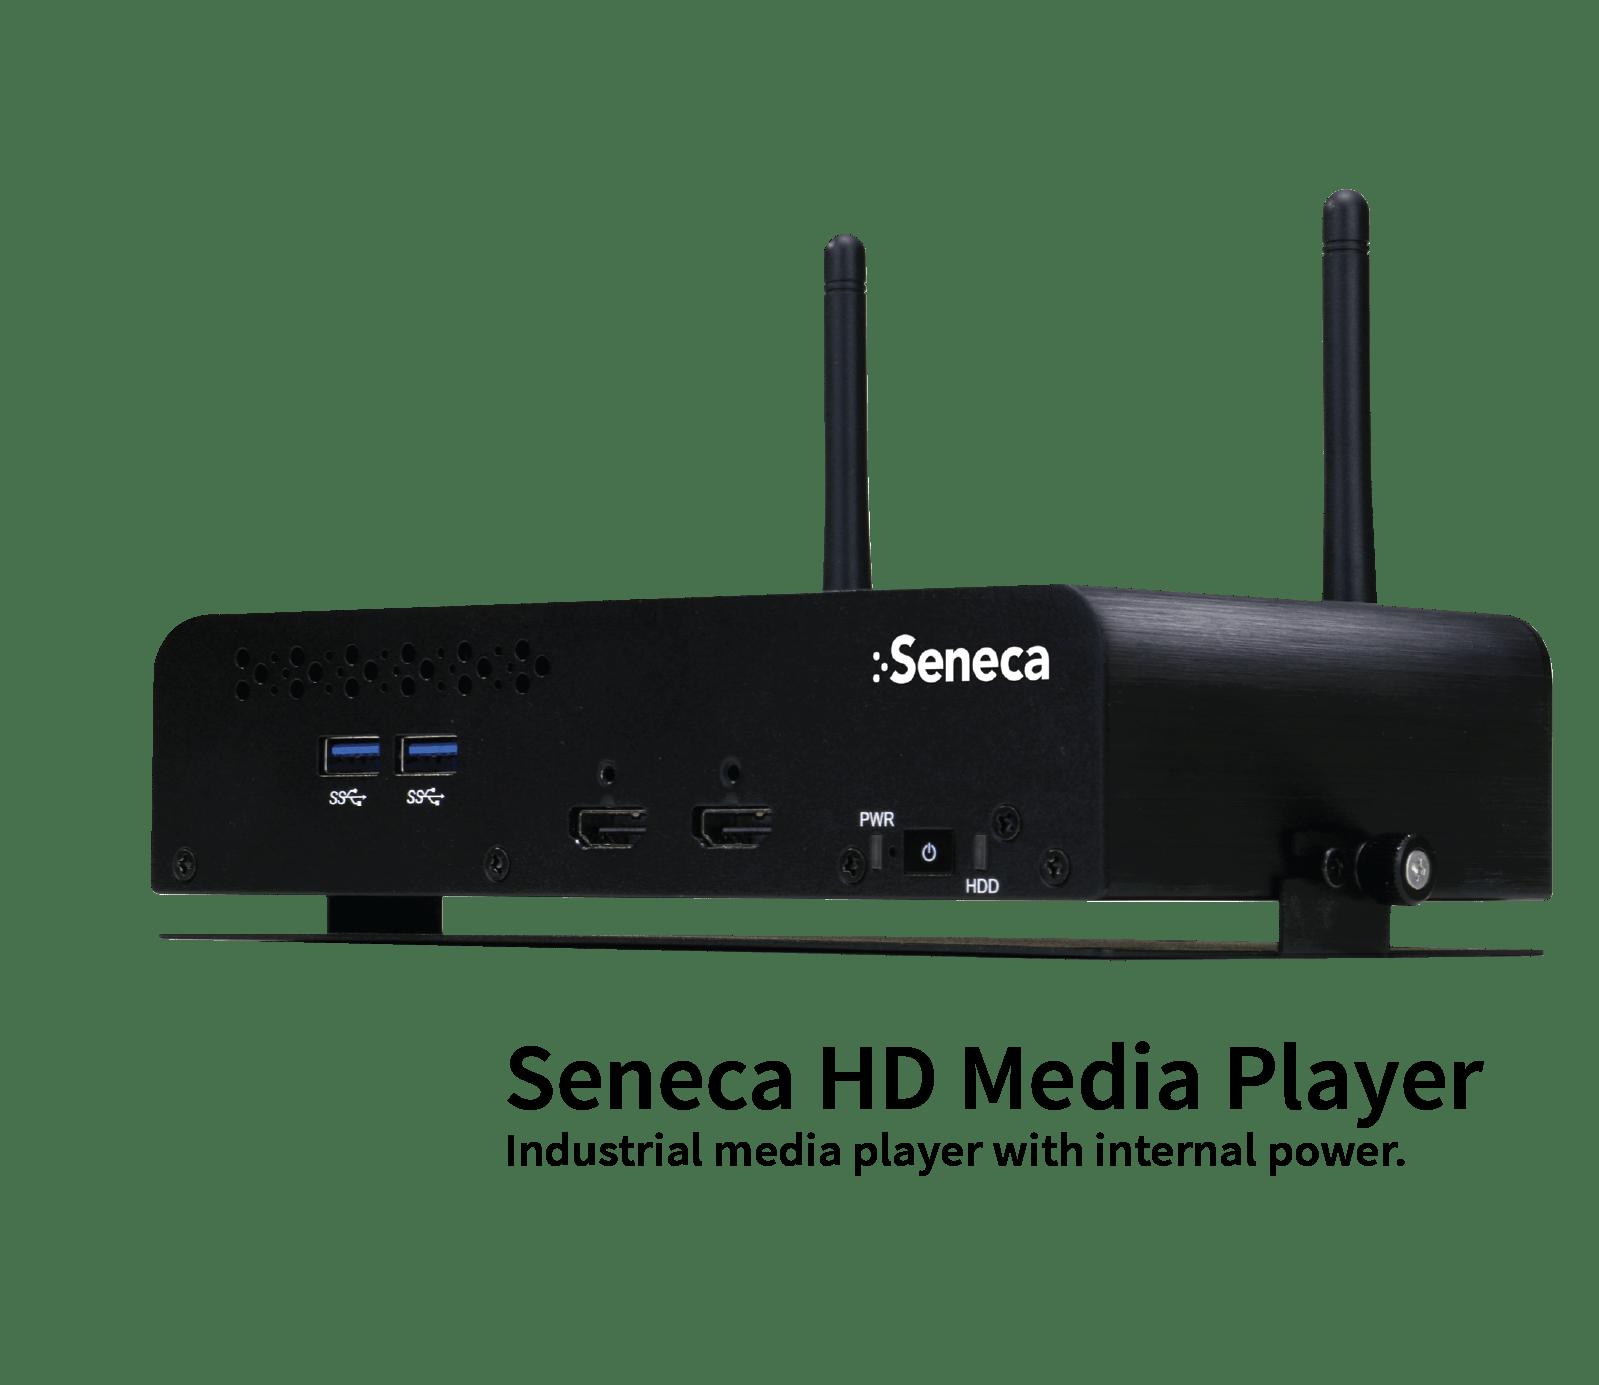 Seneca HD Media Player